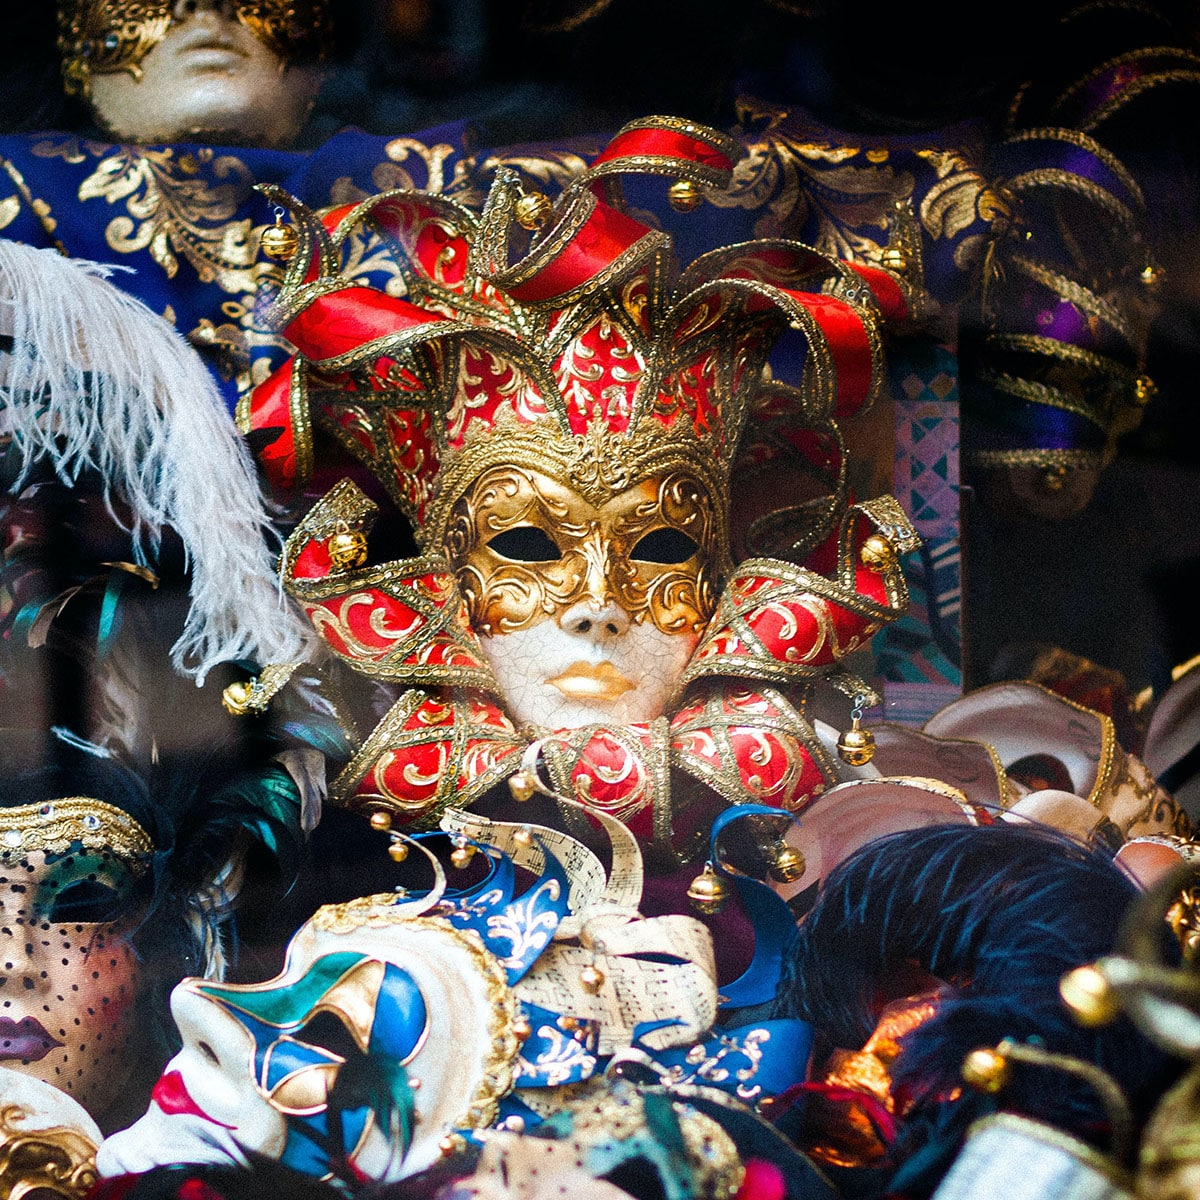 A mardi gras mask sitting atop a pile of mardi gras paraphernalia.